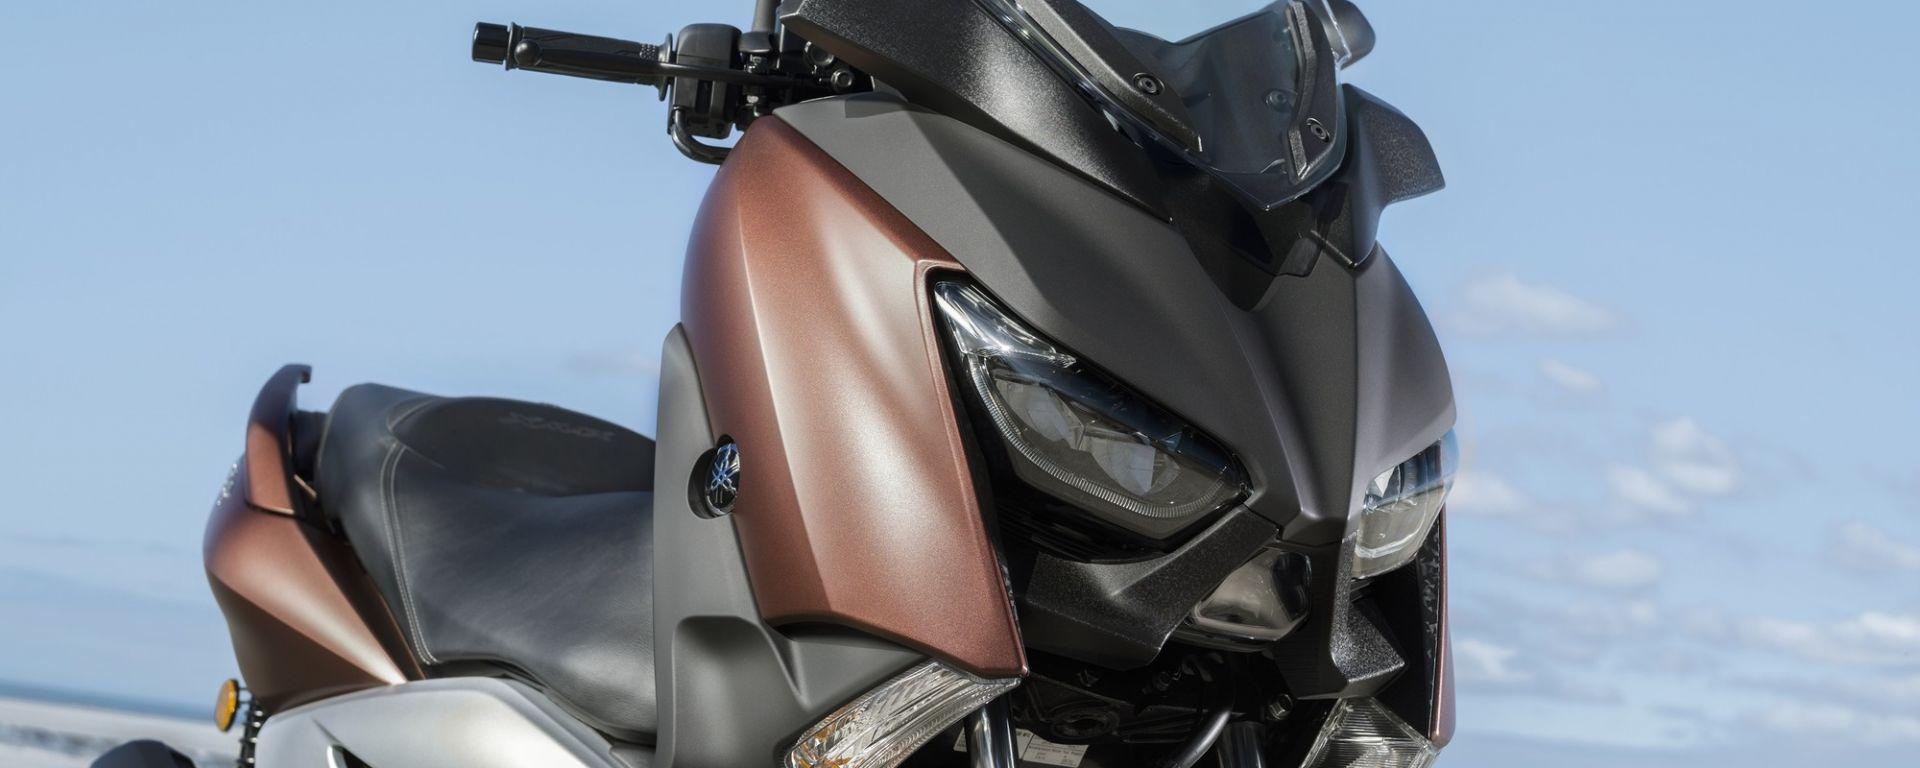 Nuovo Yamaha X-Max 300, cupolino